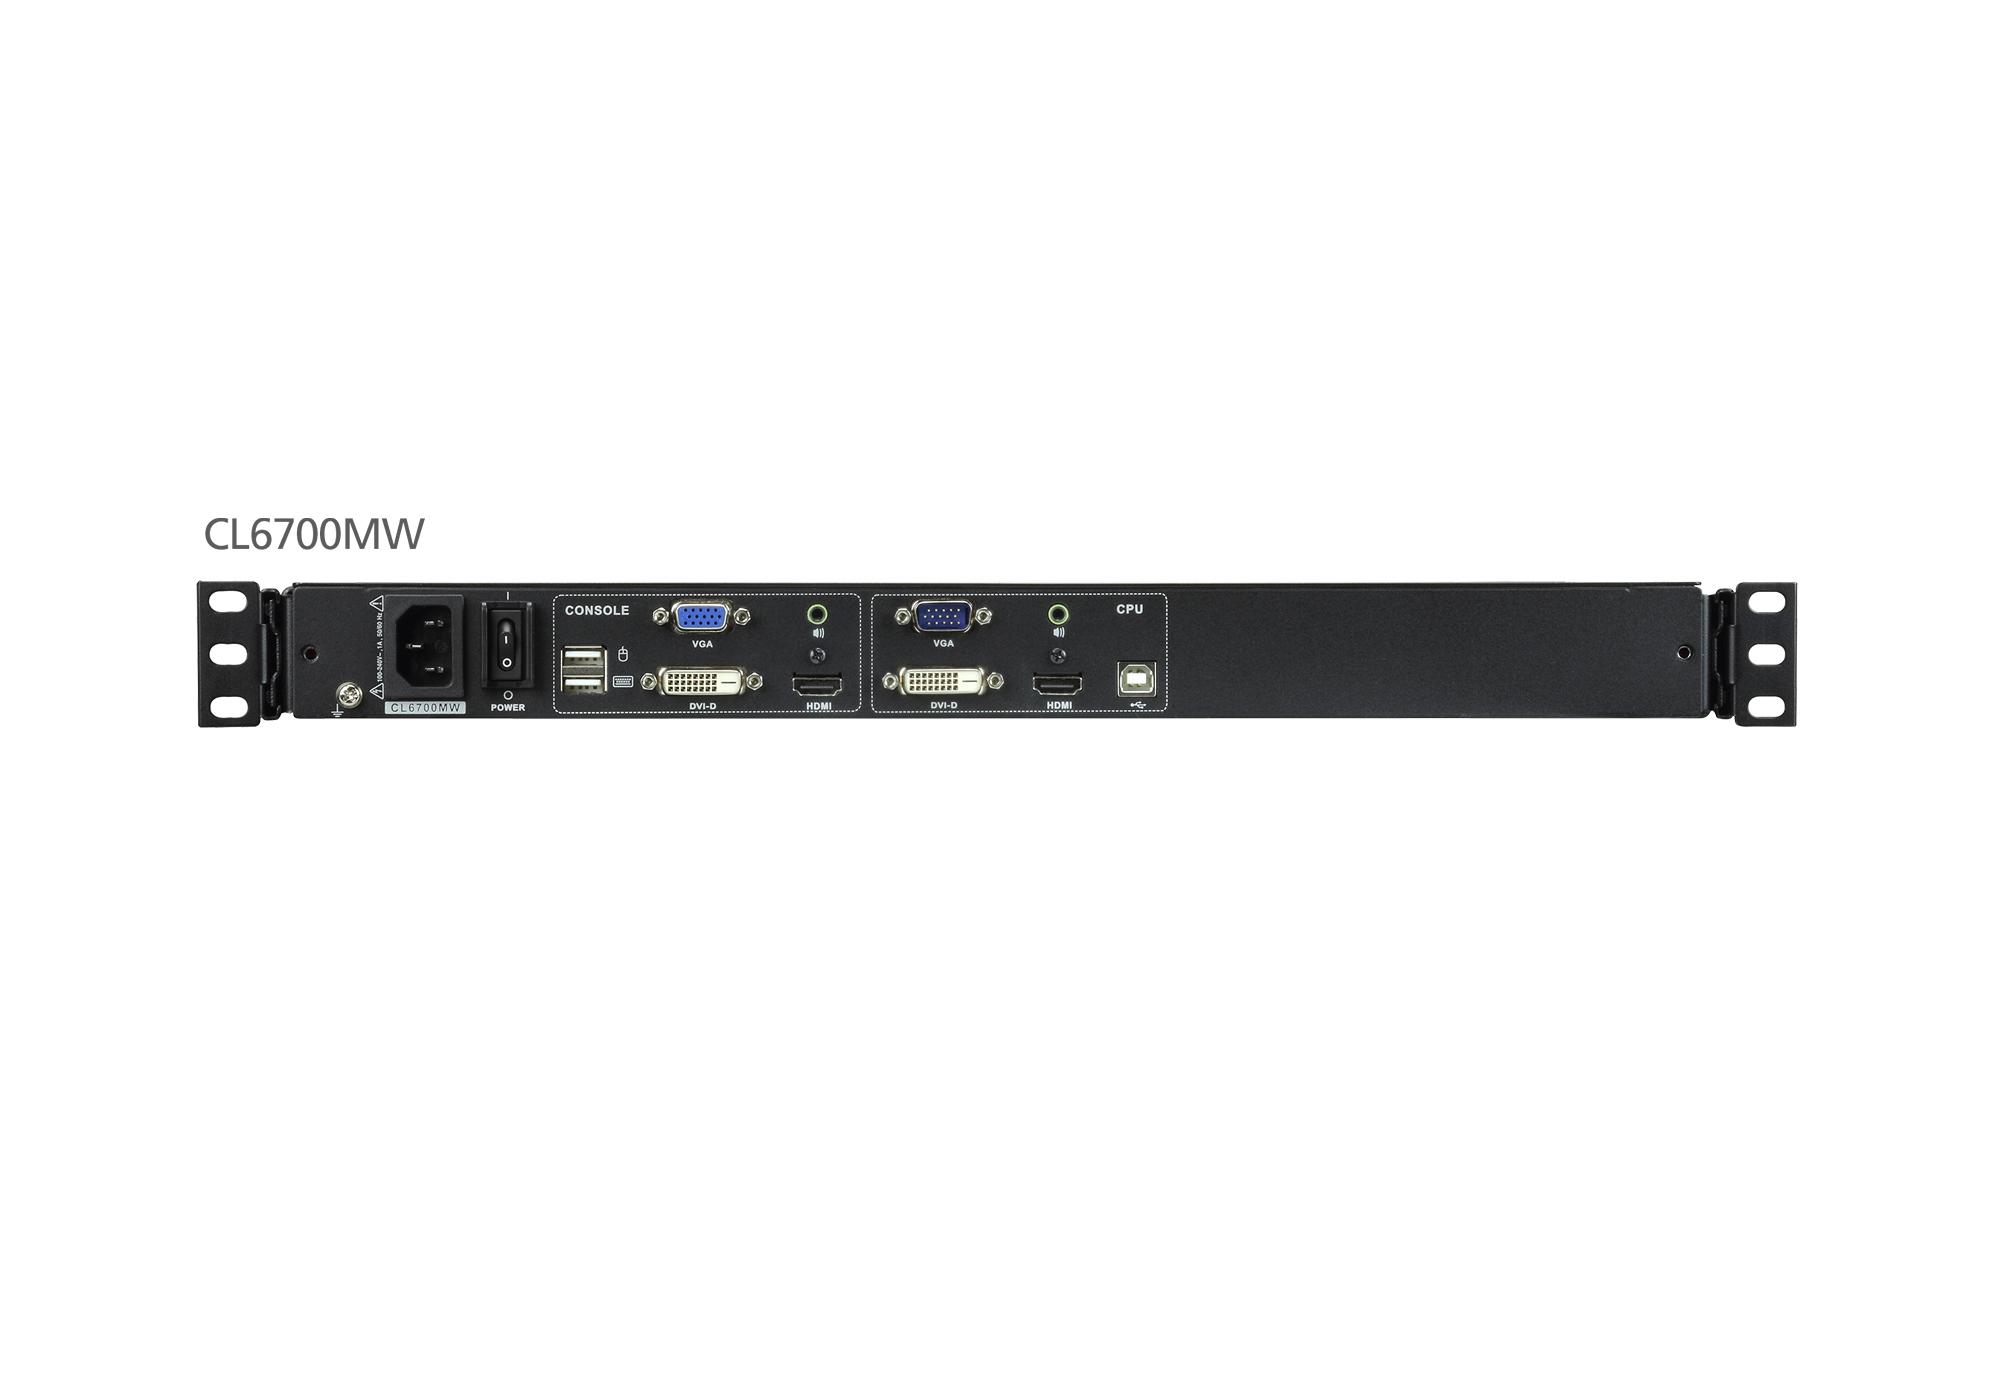 usb dvi フルhdワイド対応lcdコンソールドロワー usbデバイス対応